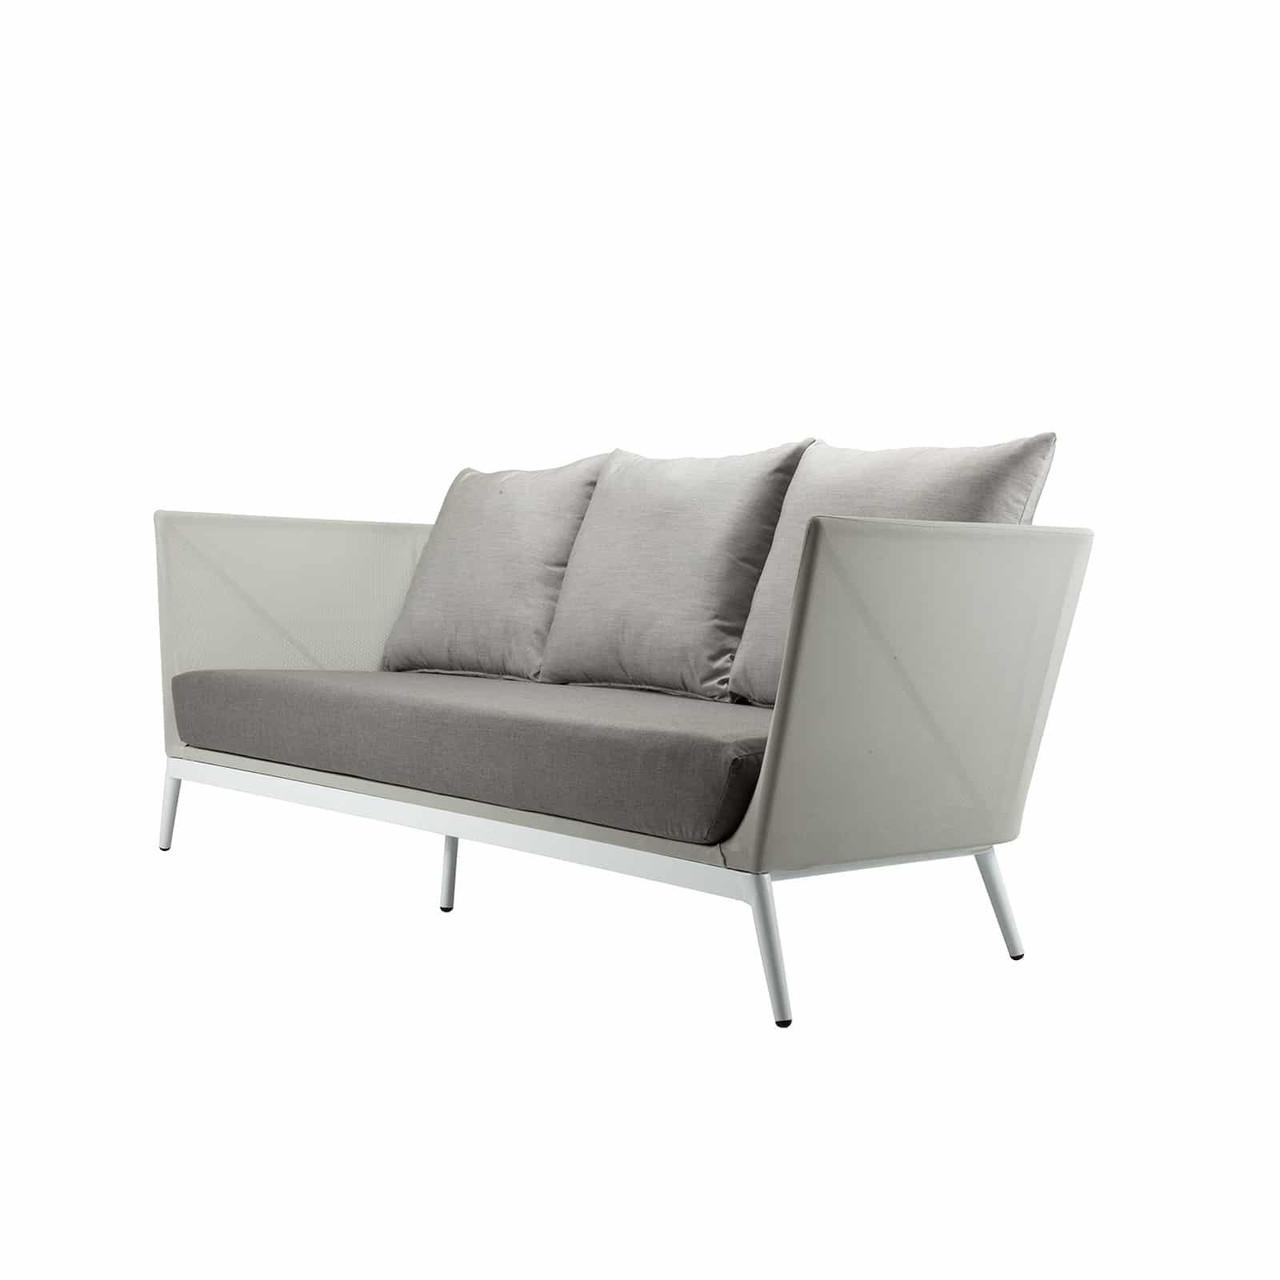 Source Furniture Cosmo Sofa - Modern Patio Design